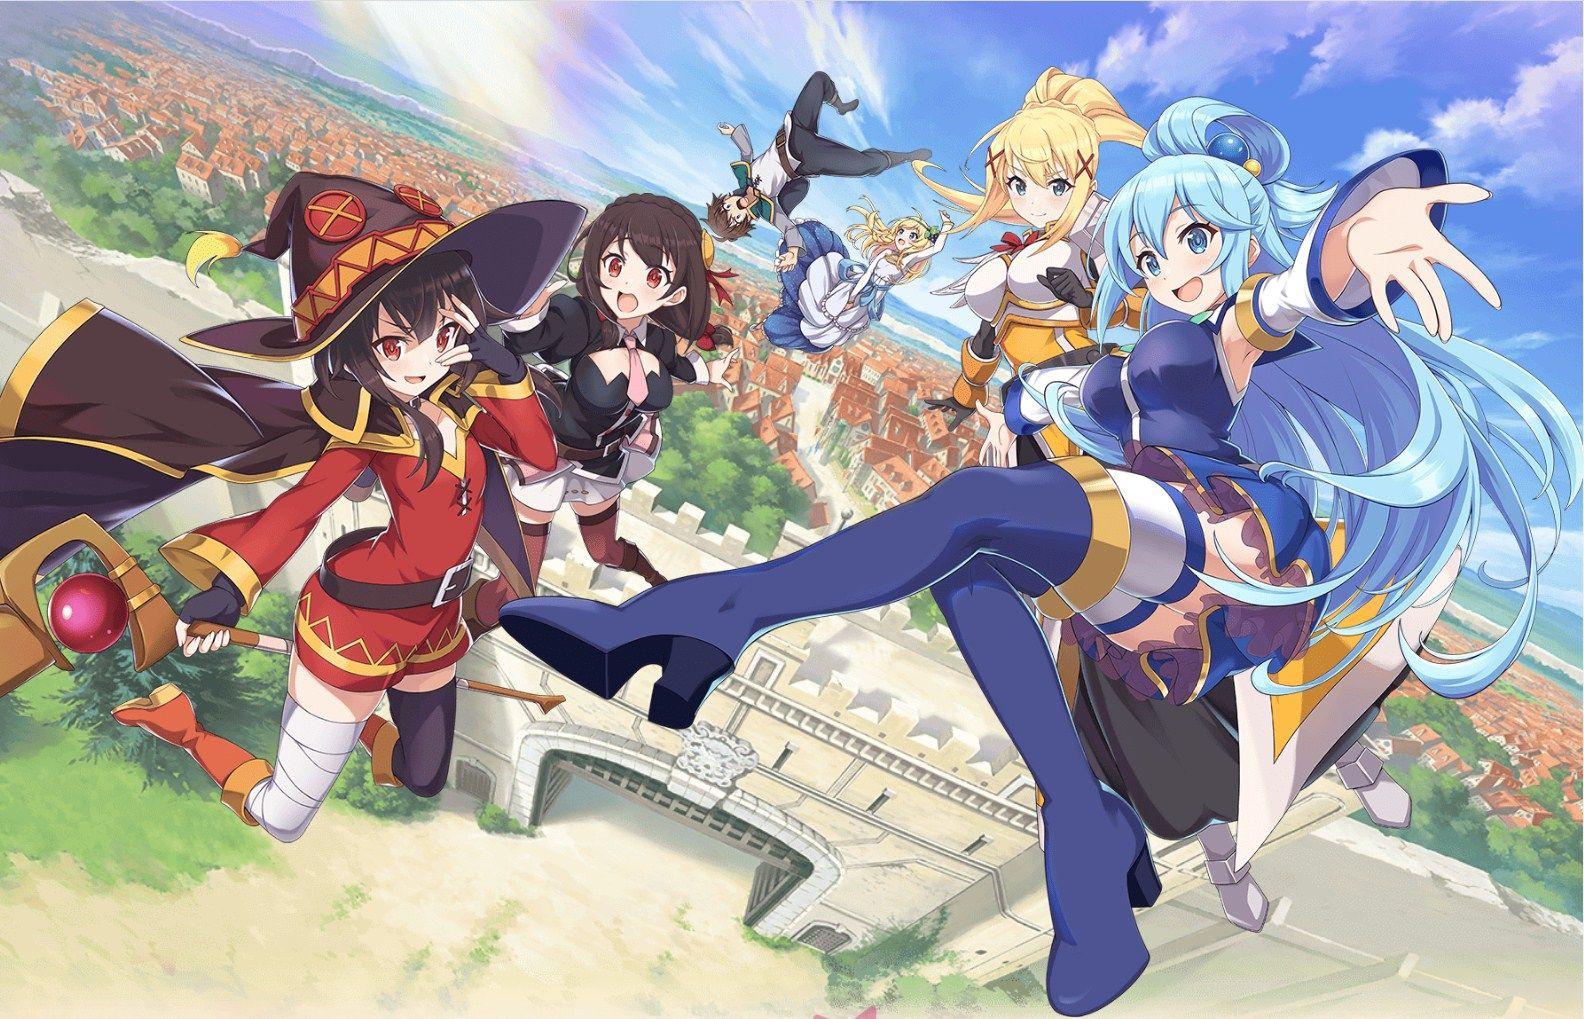 KonoSuba Fantastic Days Mobile game out in Japan en